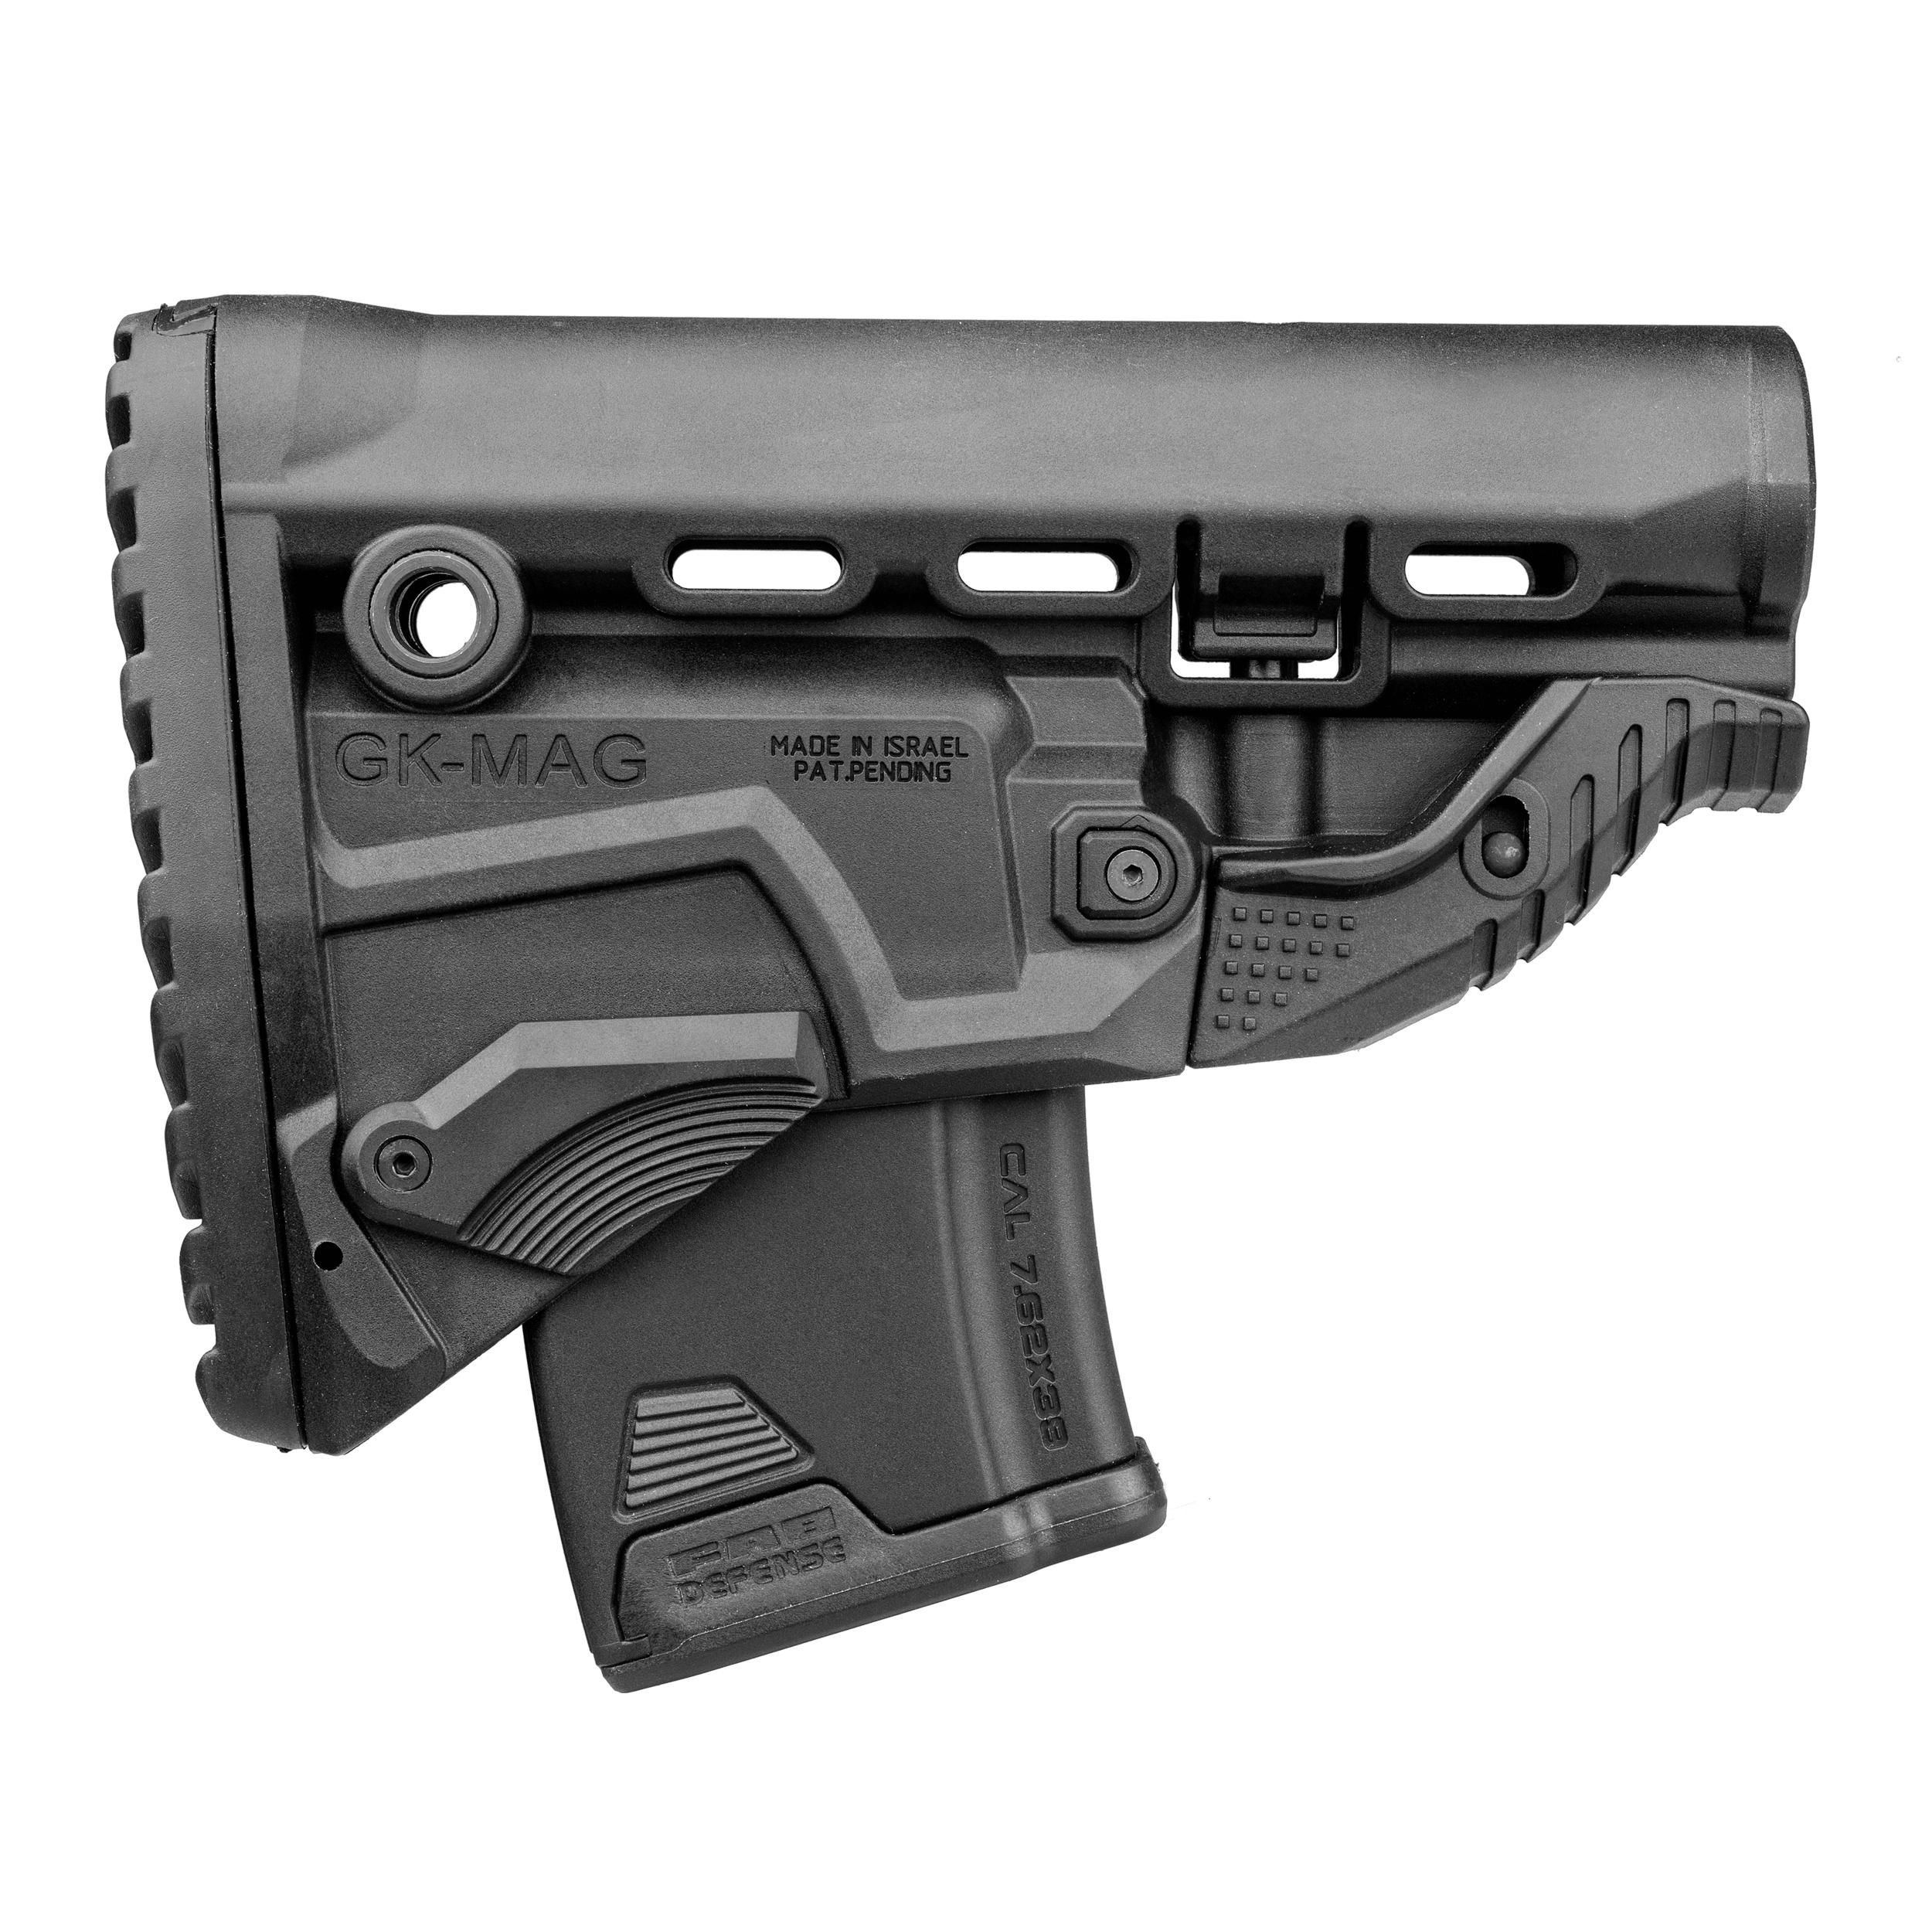 Buttstock AK47 - with 10 Round Magazine